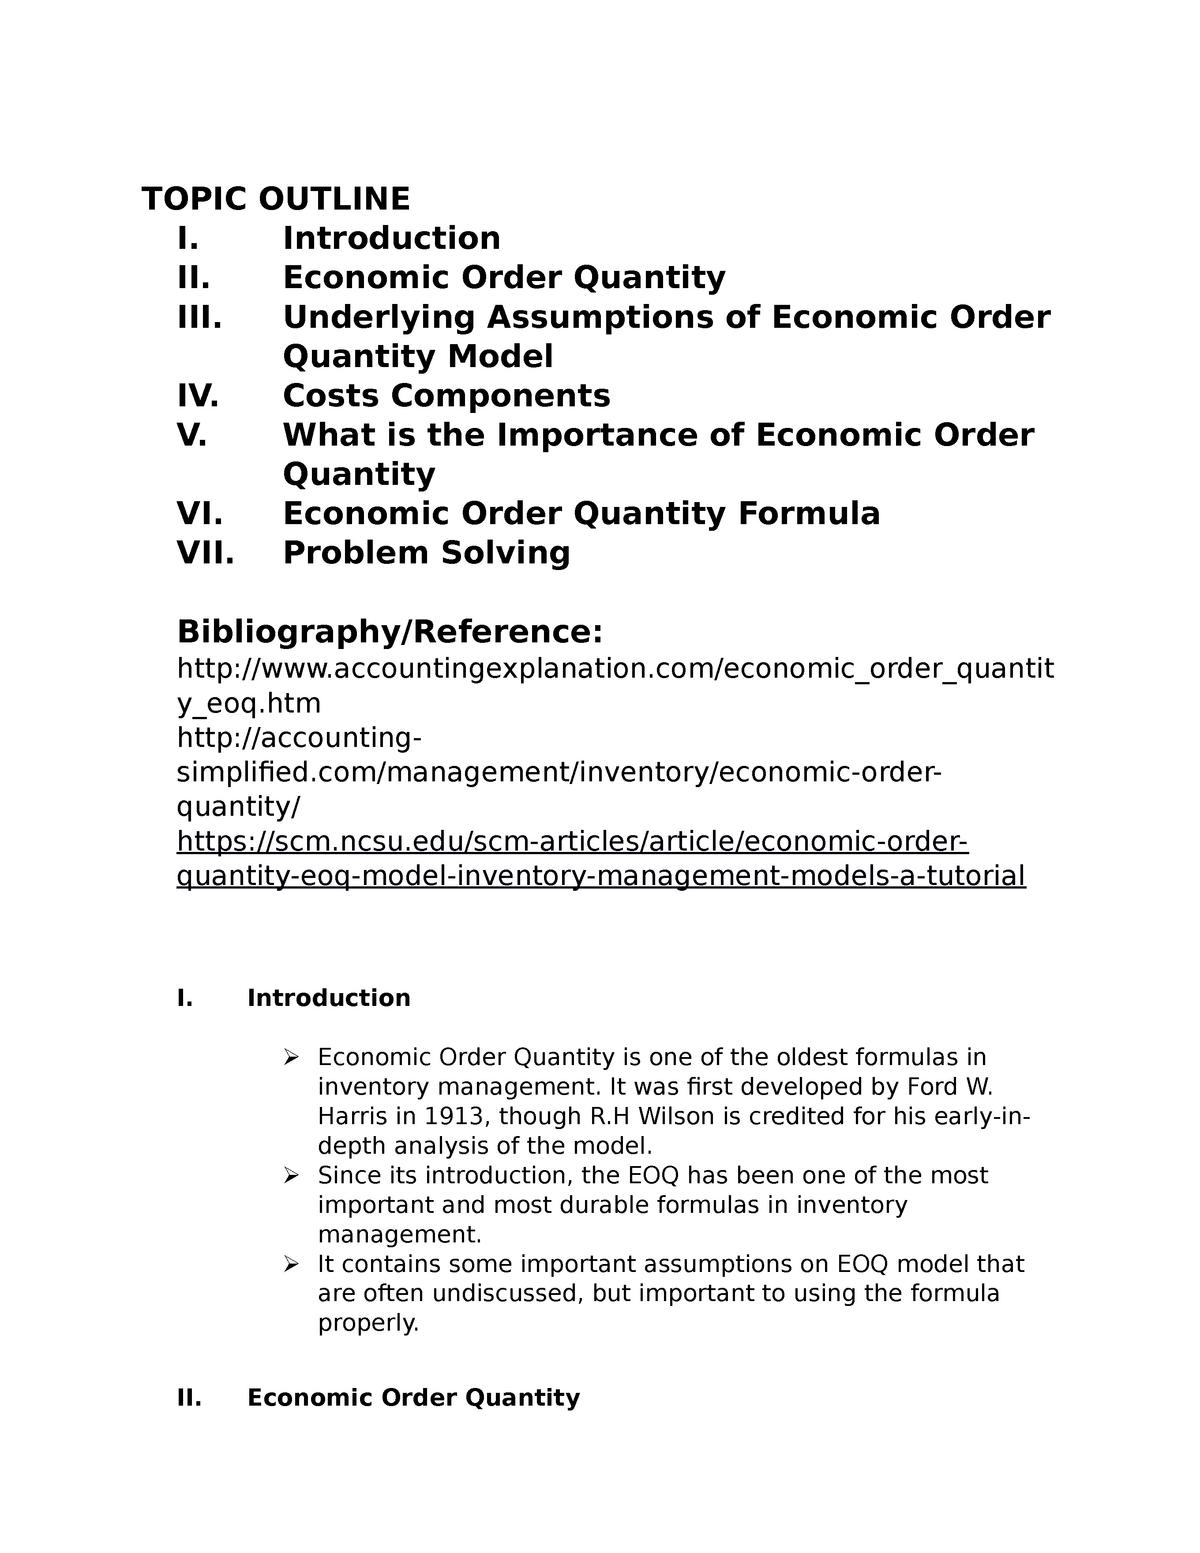 Report on Various Problems on Economic Order Quantity - StuDocu